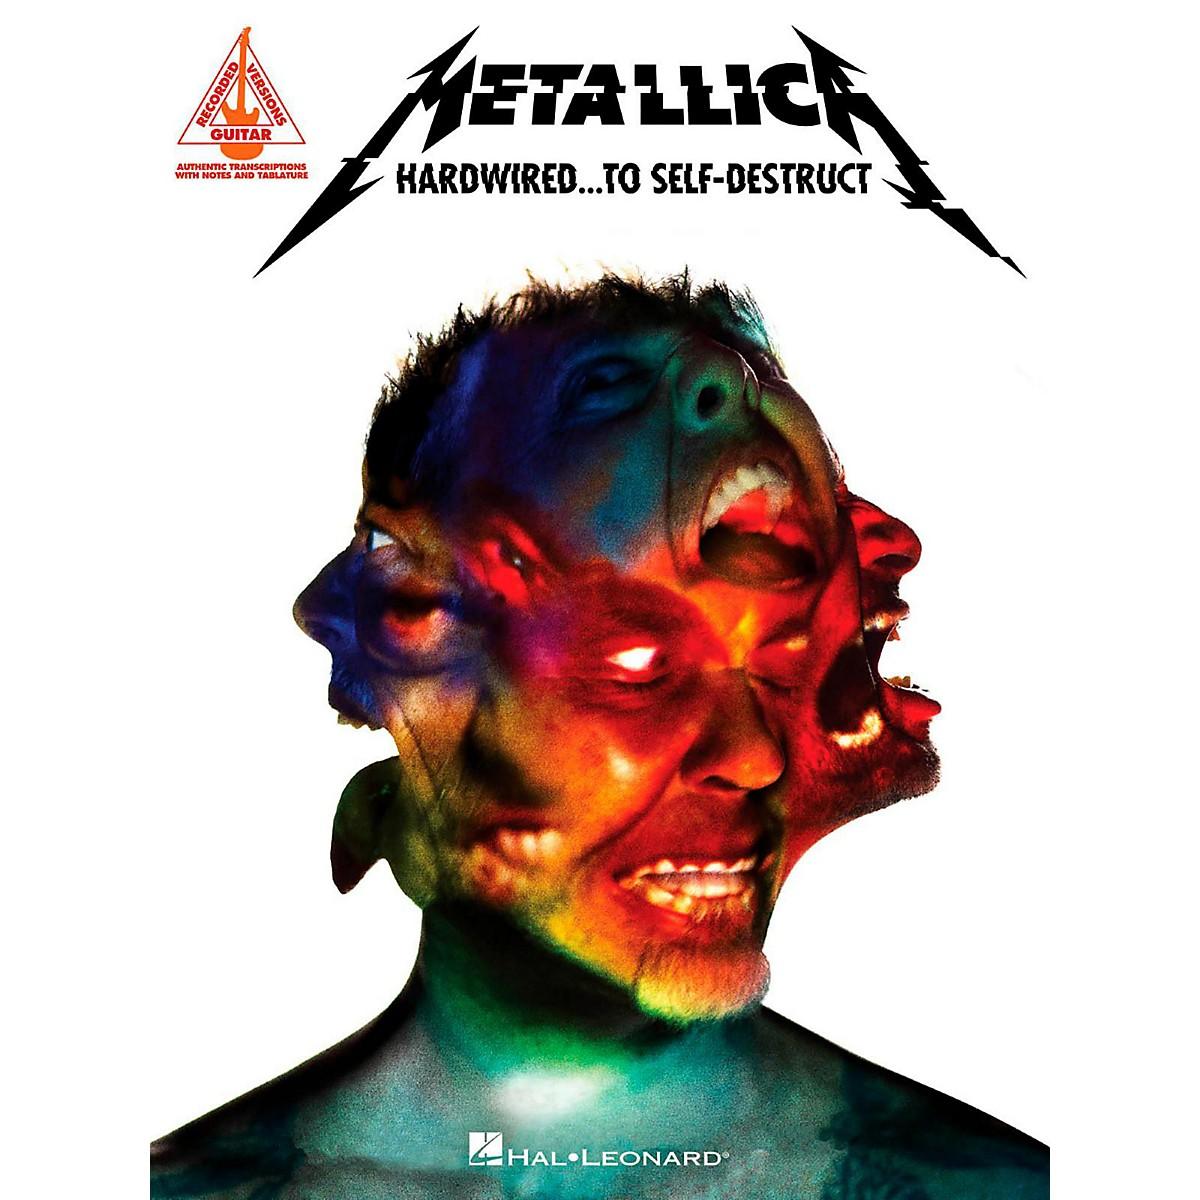 Hal Leonard Metallica - Hardwired...To Self-Destruct Guitar Tab Songbook